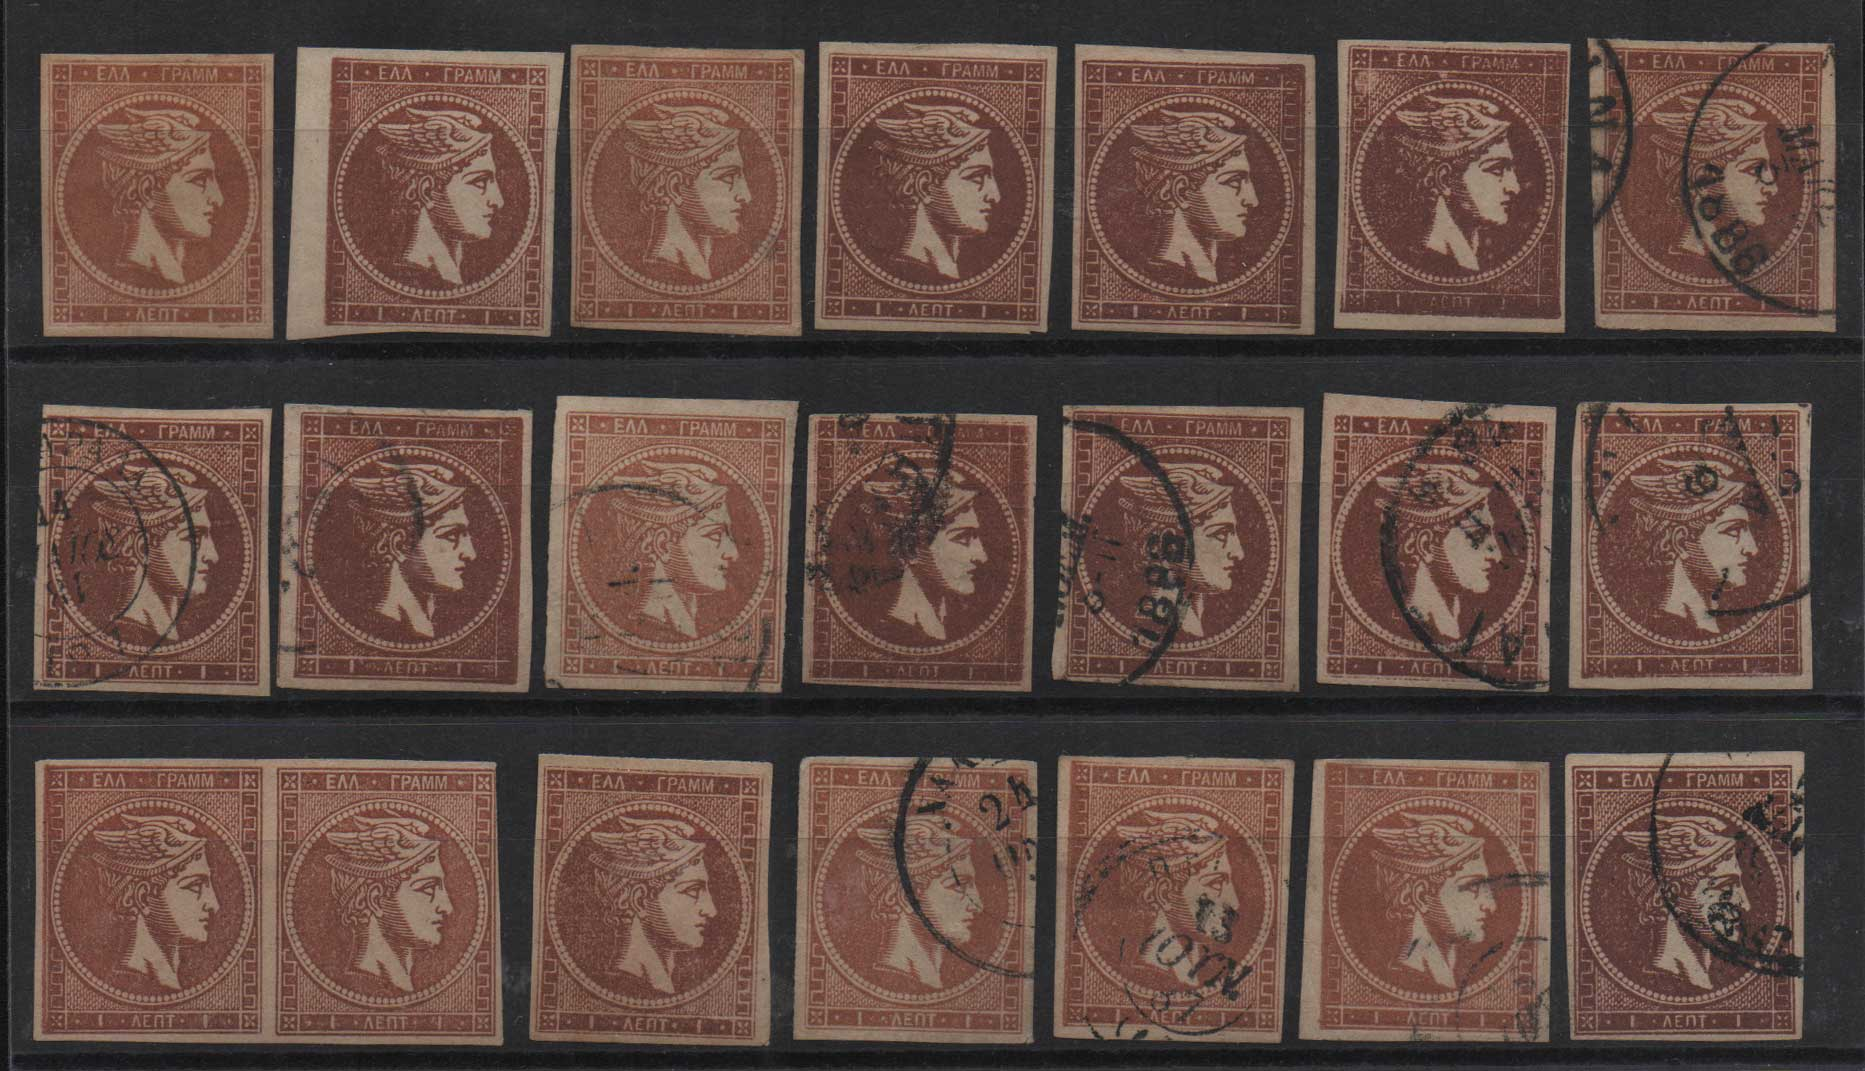 Lot 18 - large hermes head large hermes head -  Athens Auctions Public Auction 72 General Stamp Sale